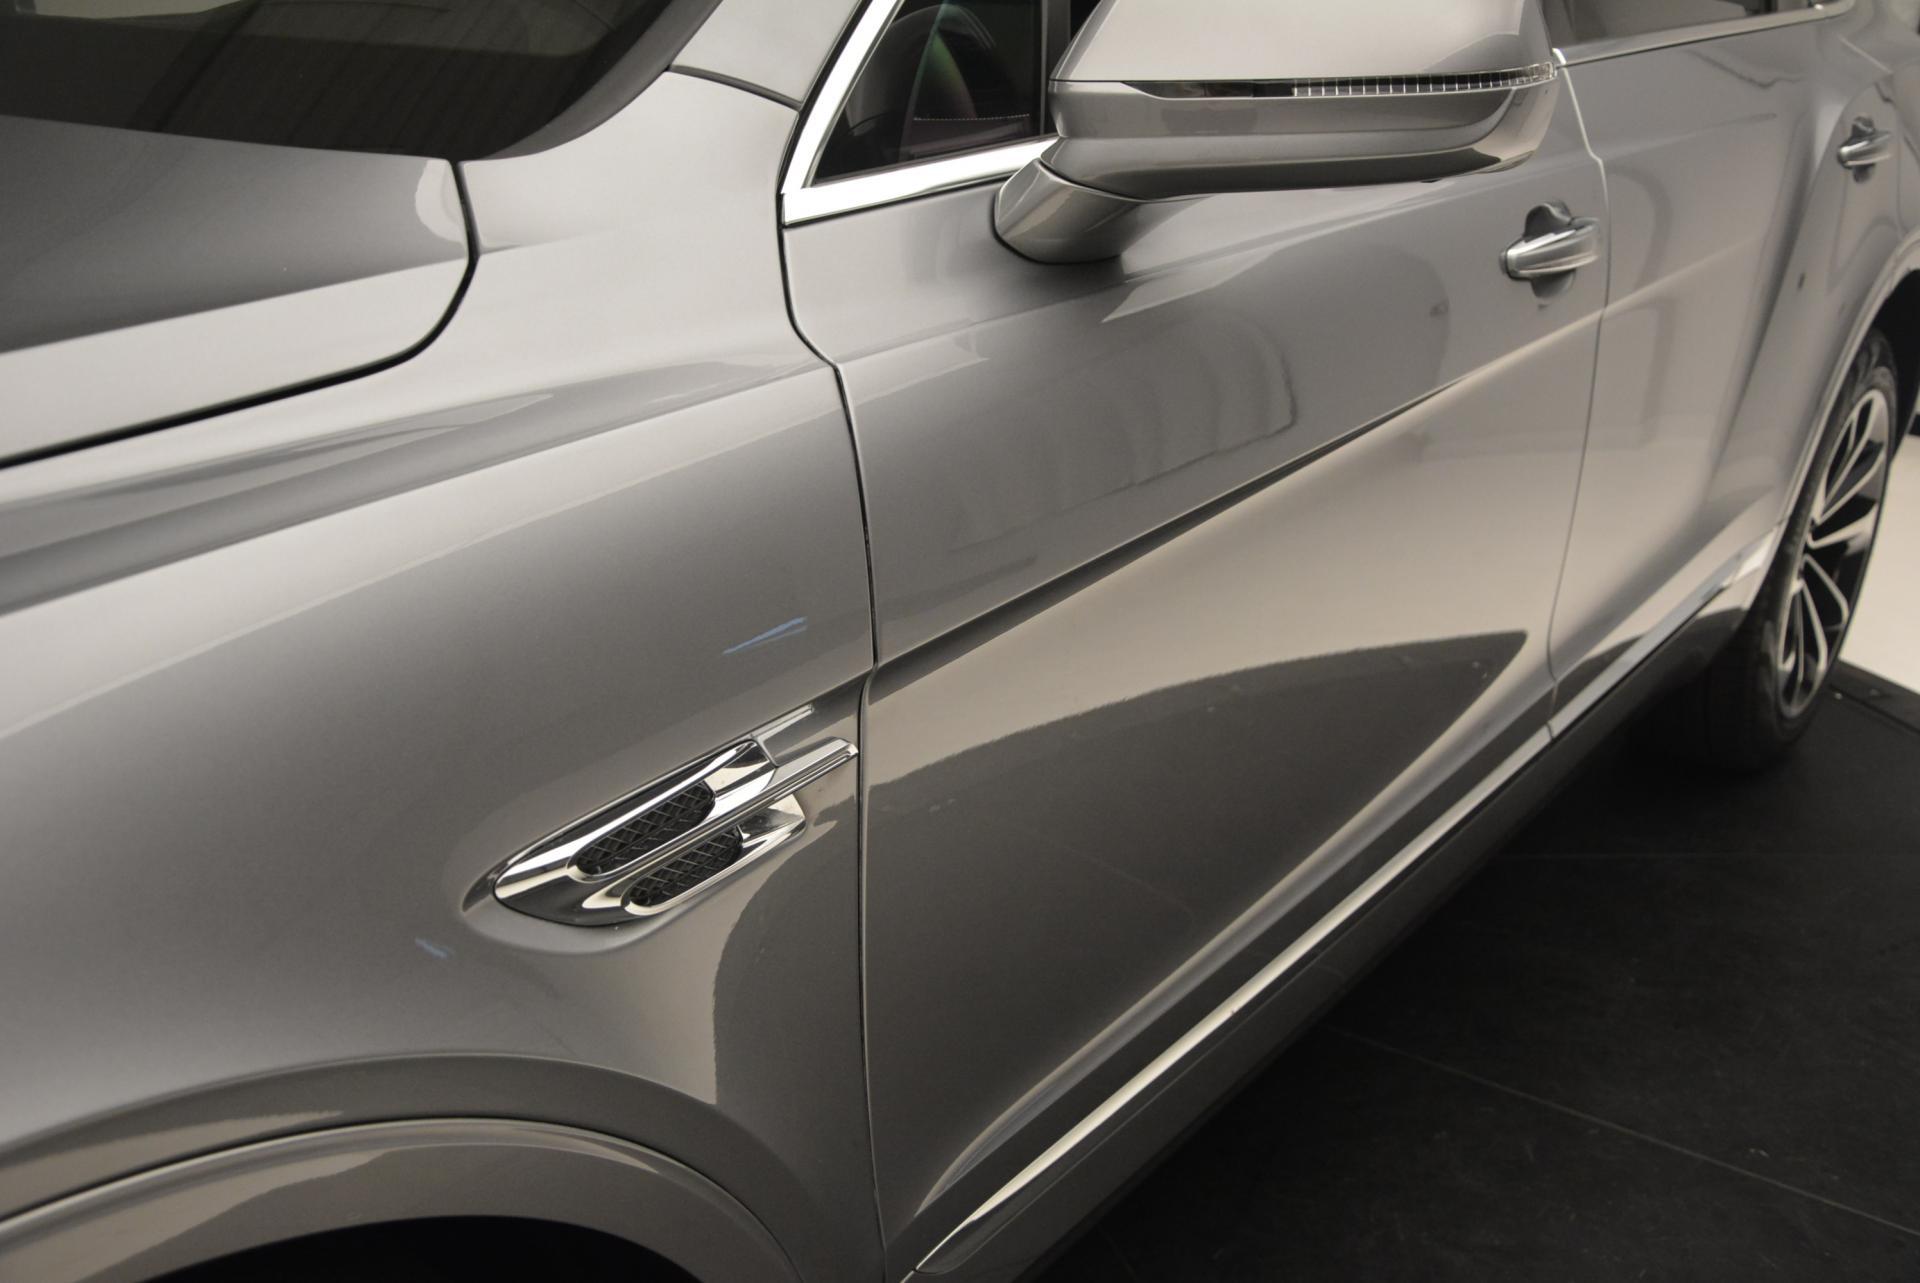 Used 2017 Bentley Bentayga W12 For Sale In Greenwich, CT. Alfa Romeo of Greenwich, 7270 511_p19